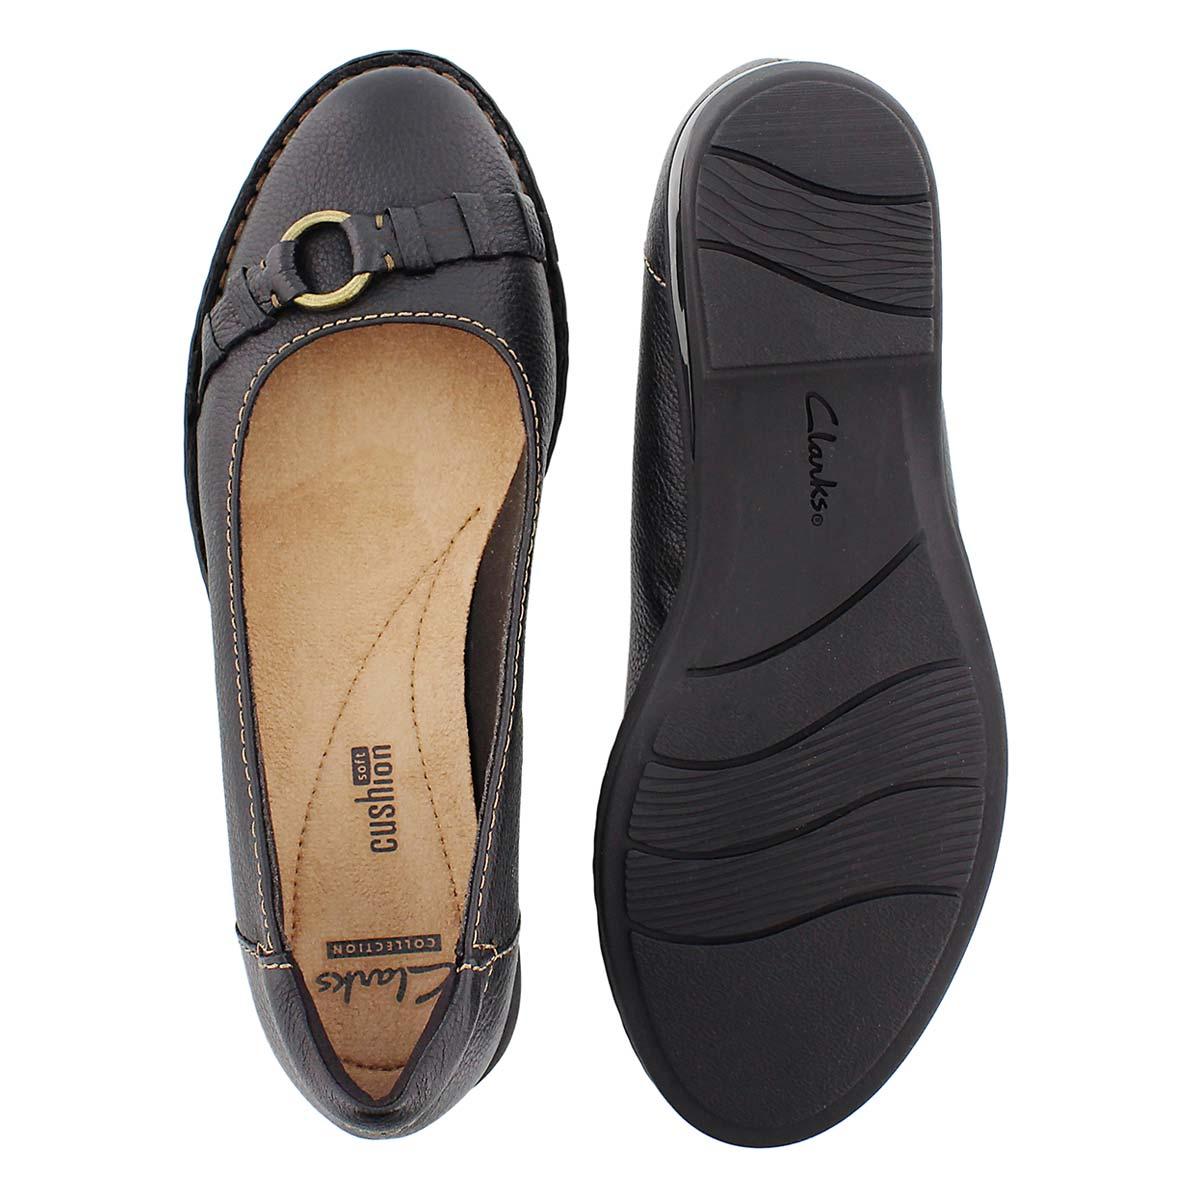 Lds Pegg Alba black slip on flat